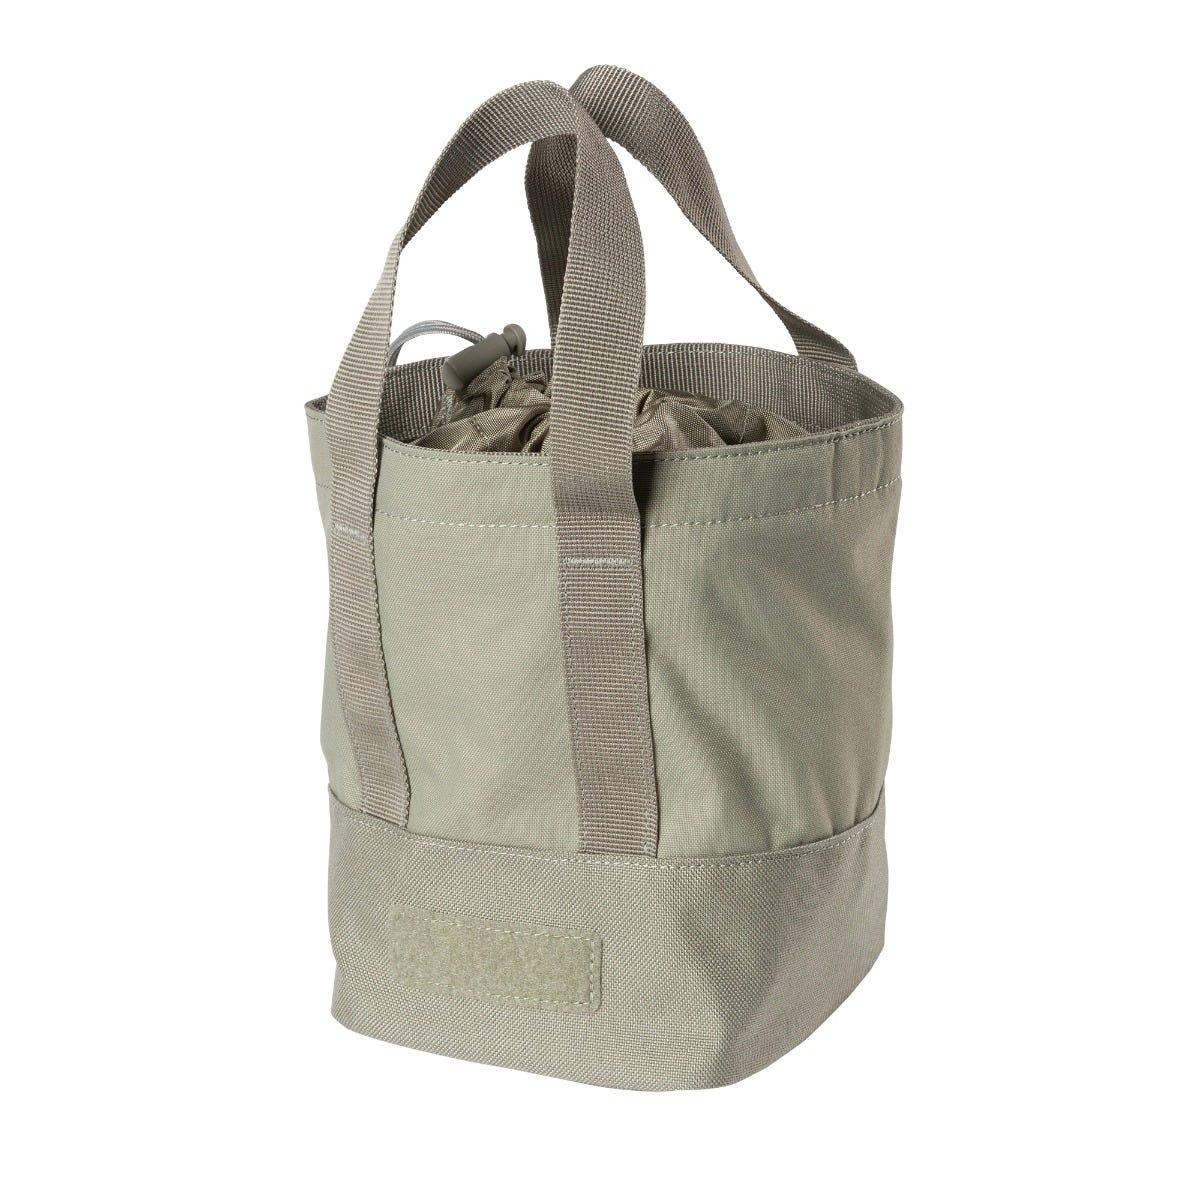 5.11 Tactical Range Master Bucket Bag 4L (Python) thumbnail